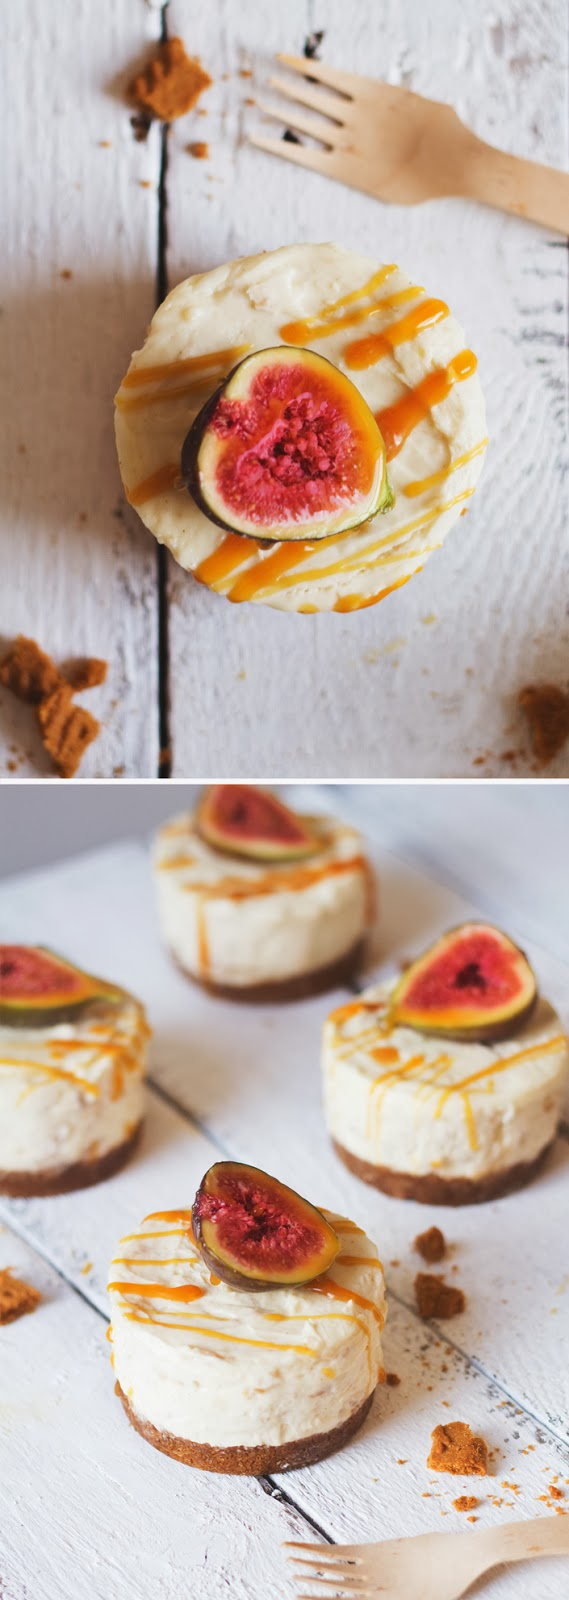 fig-and-pear-spiced-cheesecake-2.jpg